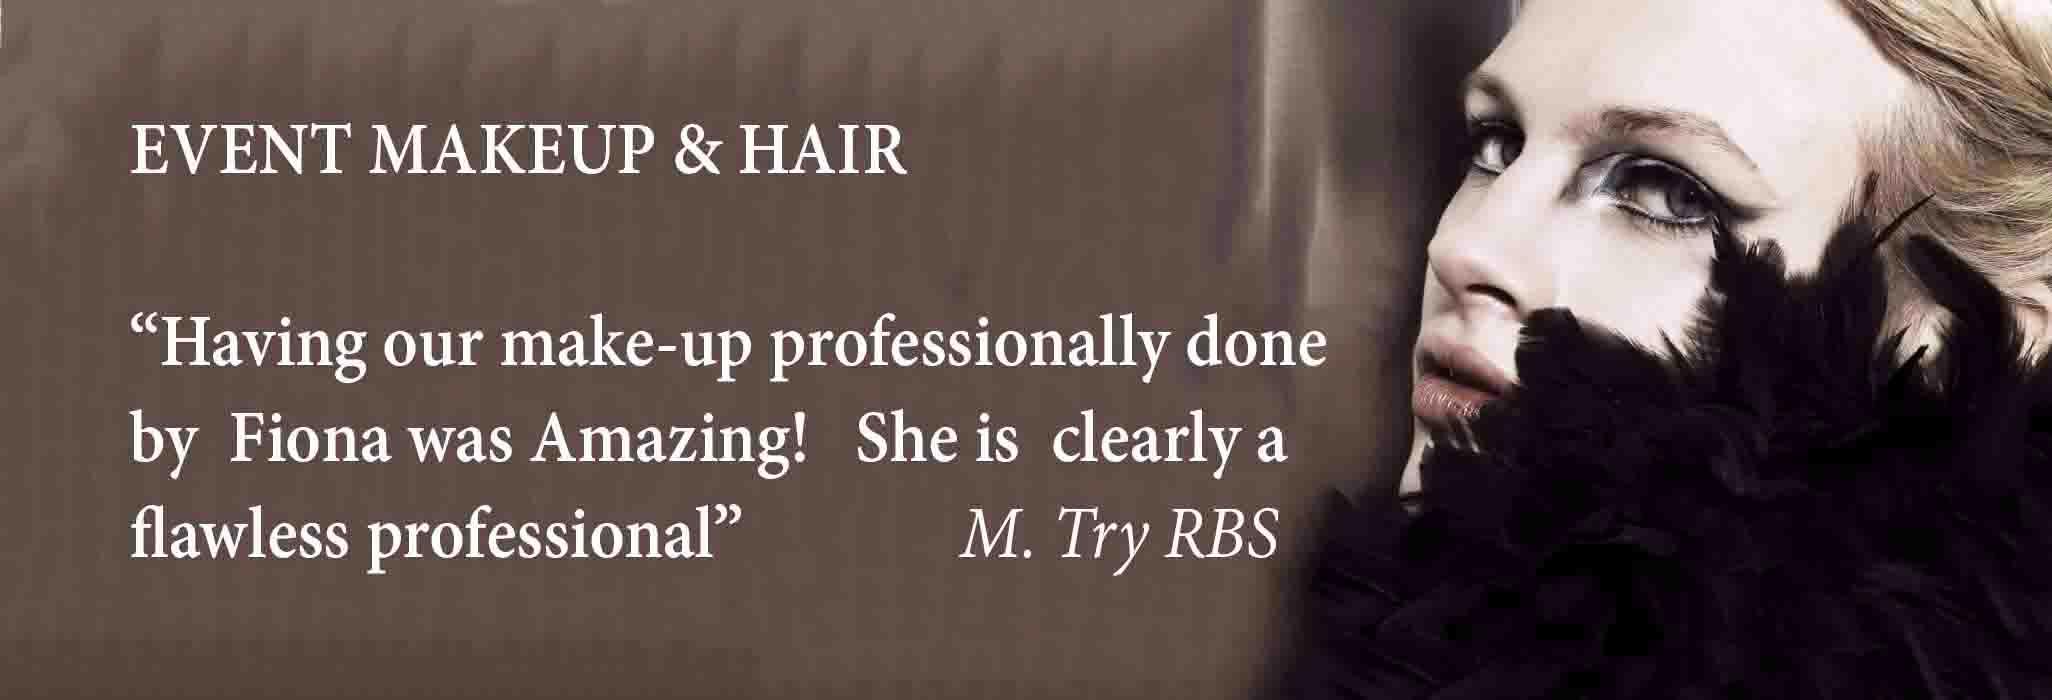 event hair and makeup London FT splash